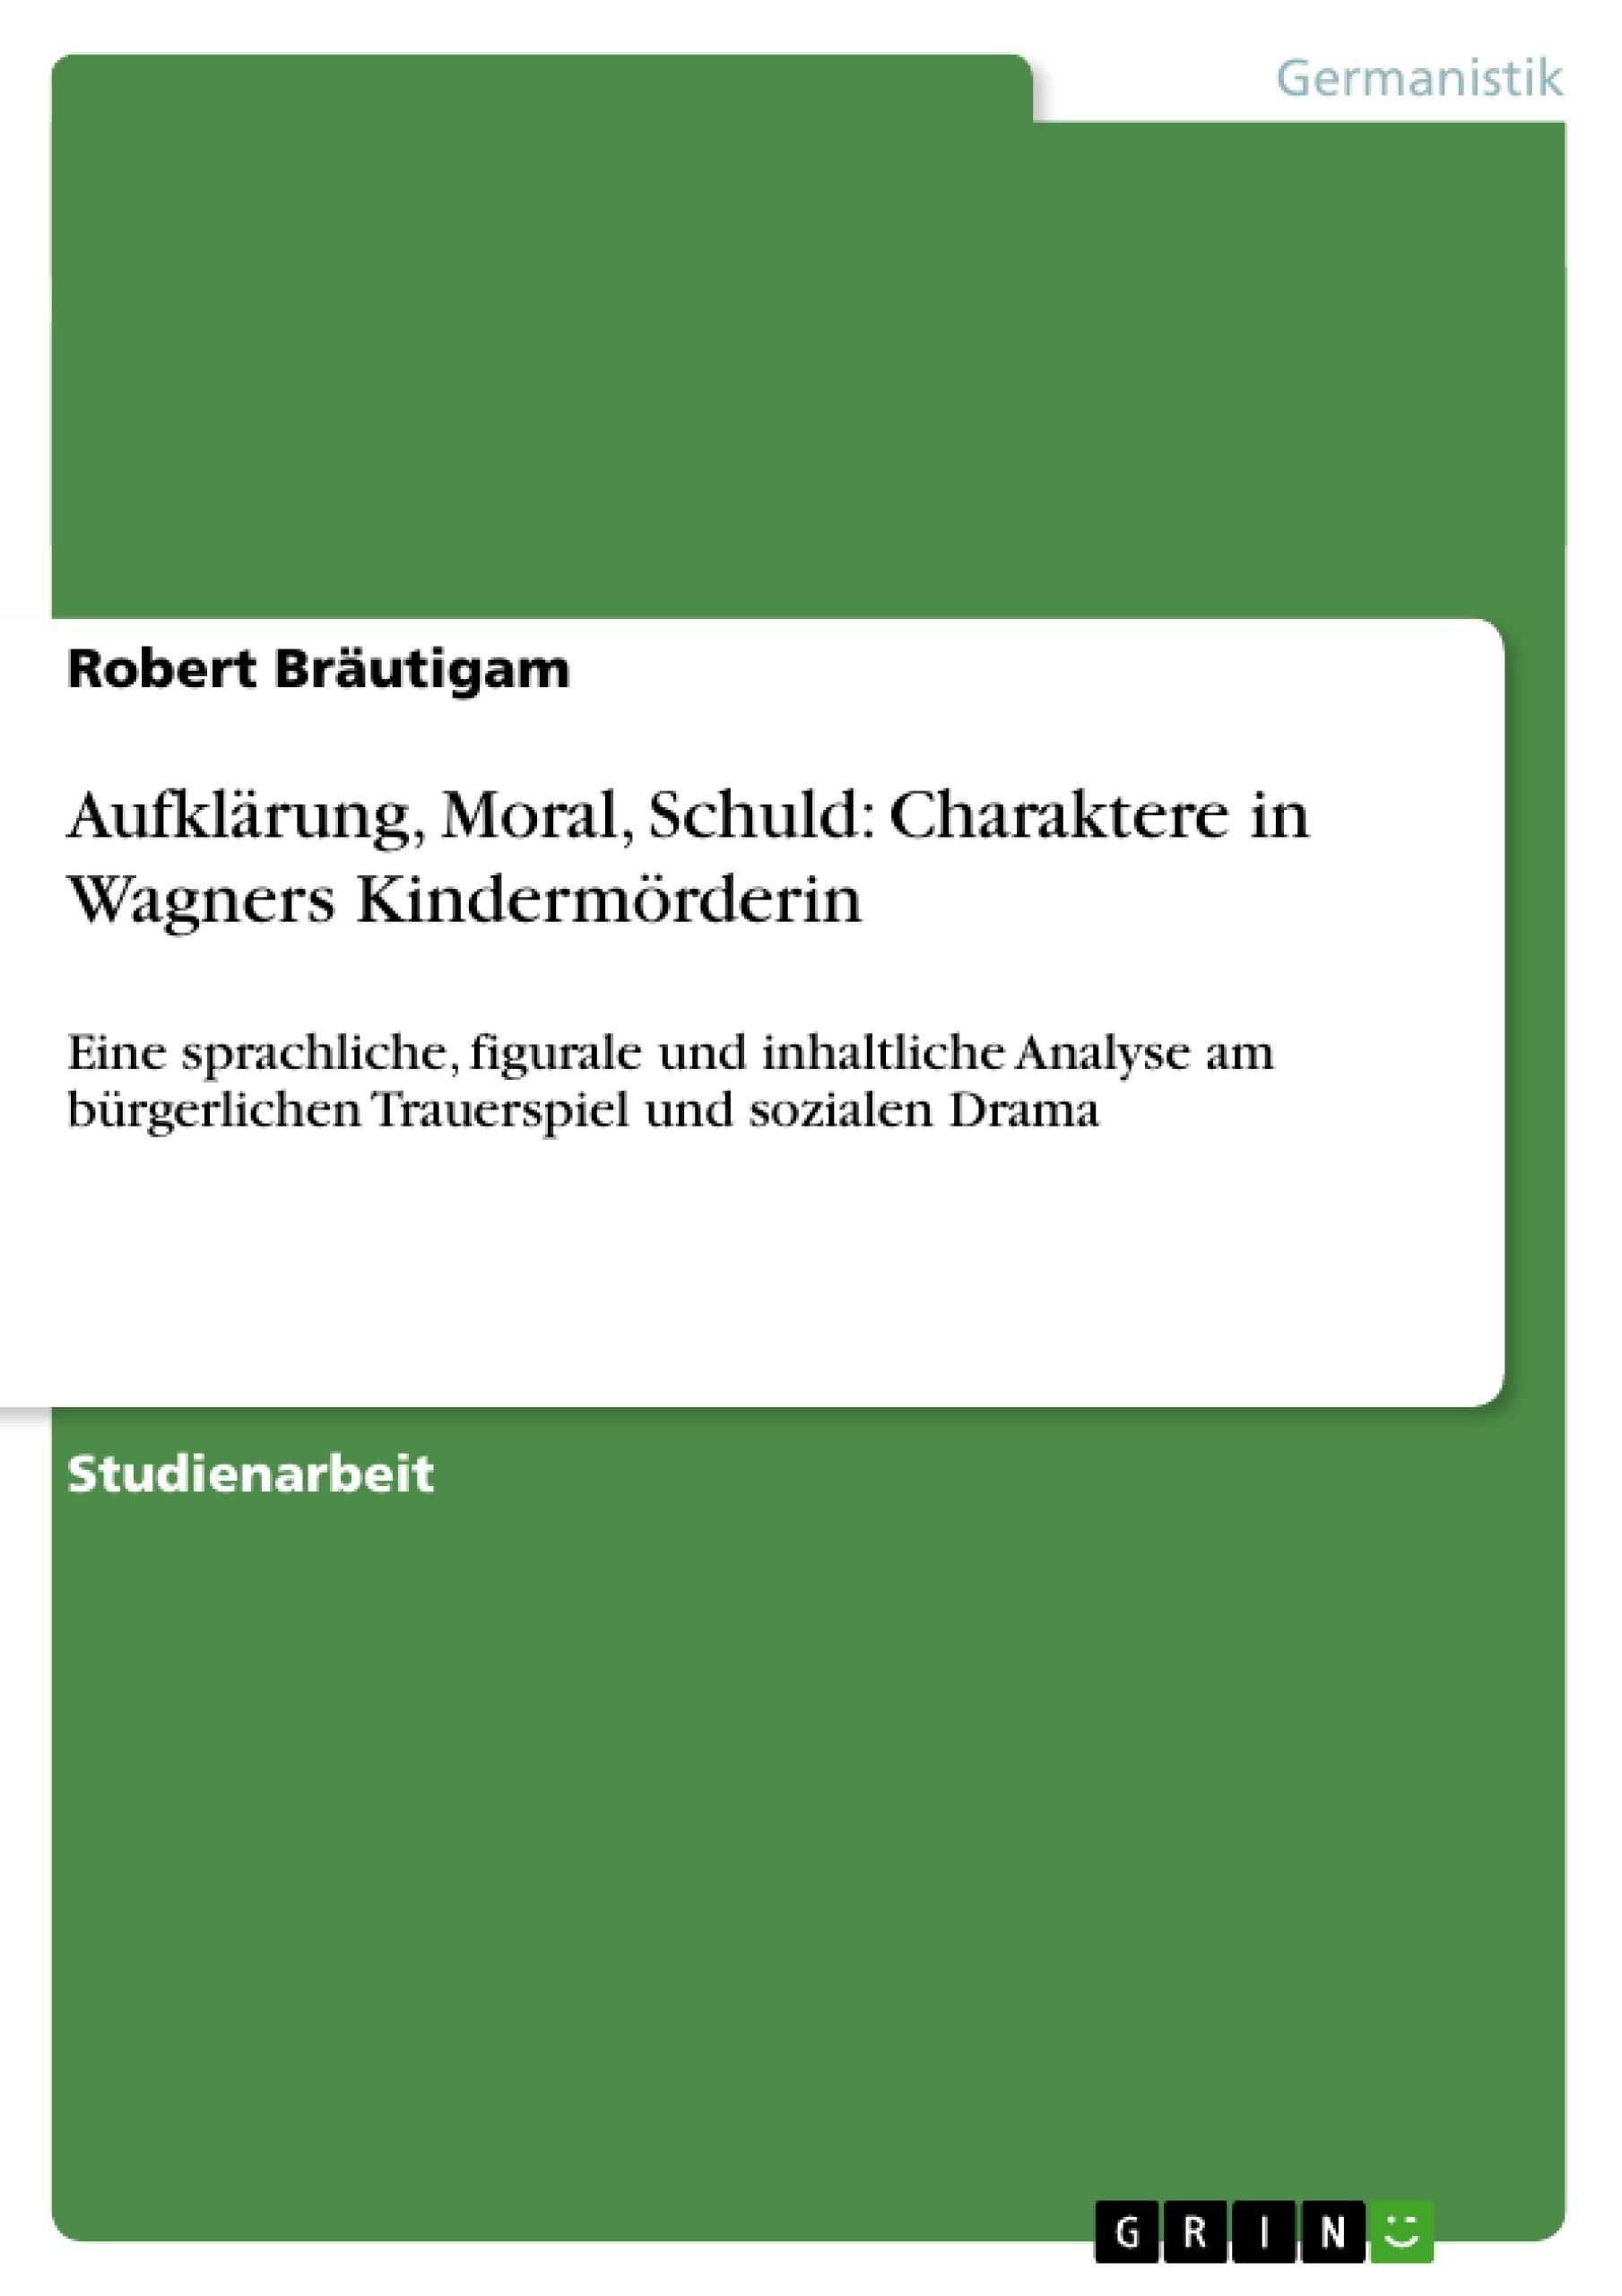 Titel: Aufklärung, Moral, Schuld: Charaktere in Wagners Kindermörderin